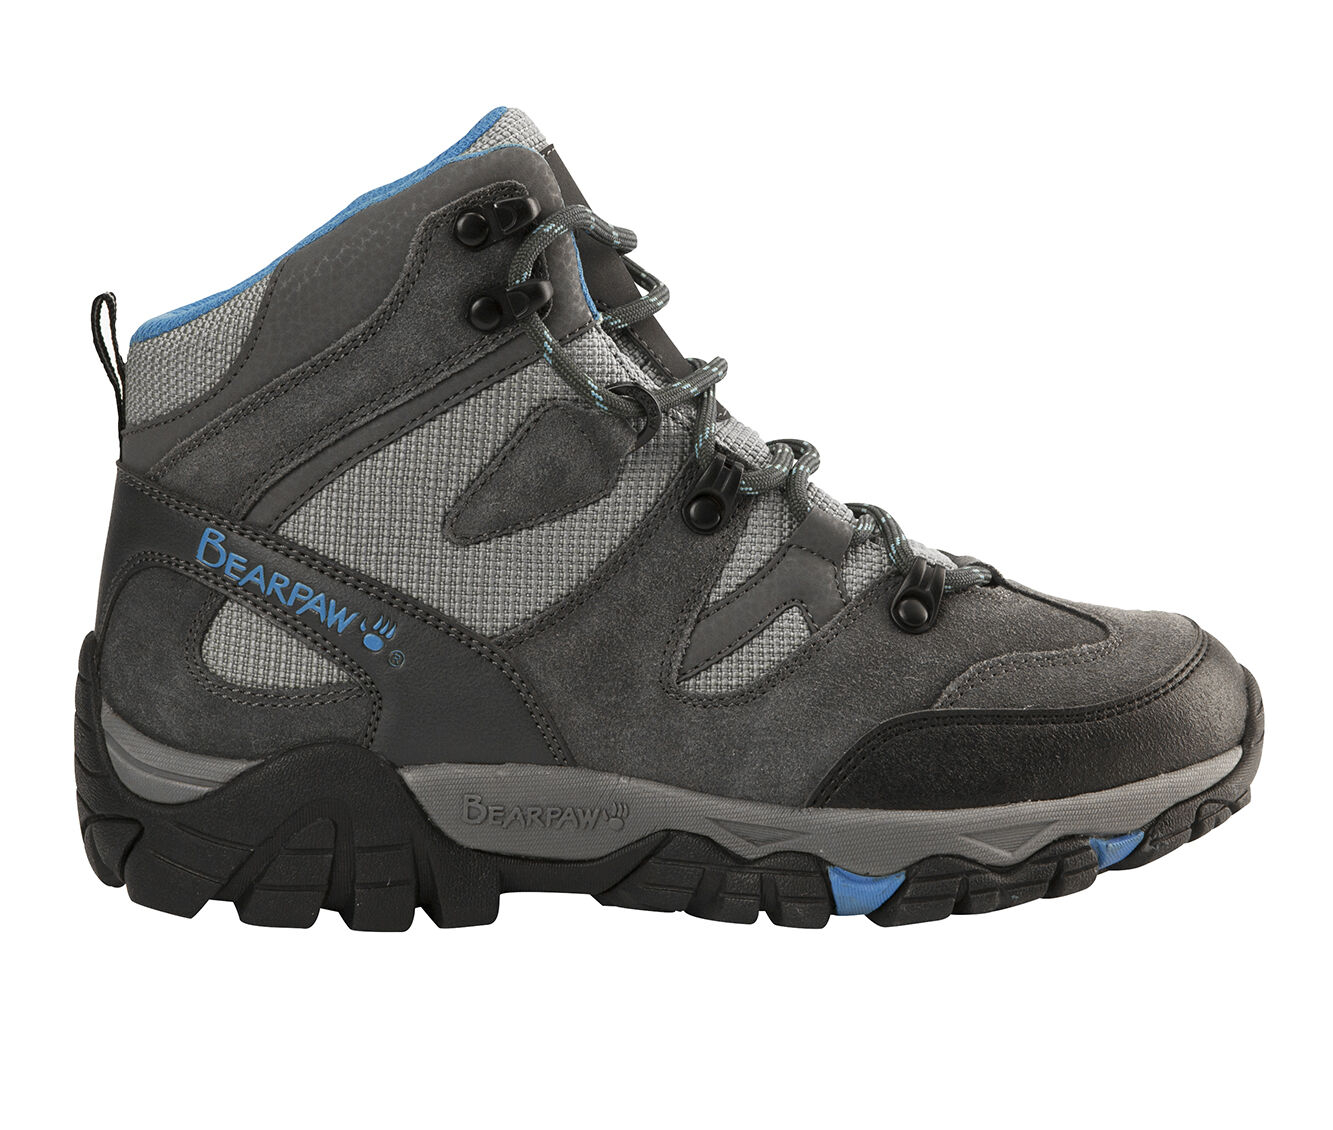 Women's Bearpaw Corsica Hiking Boots Charcoal